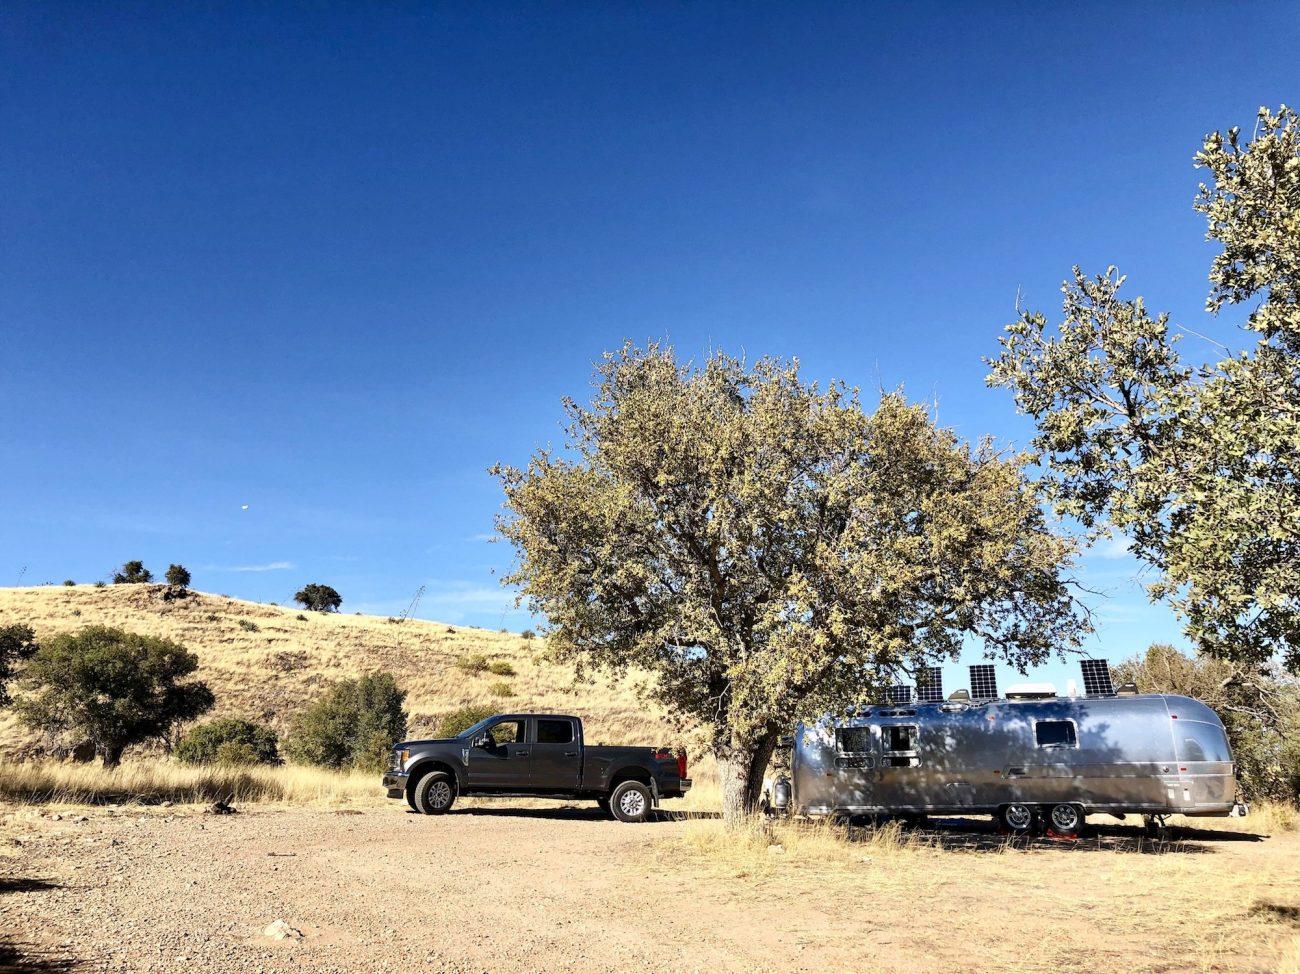 Airstream boondocking in Hereford, AZ